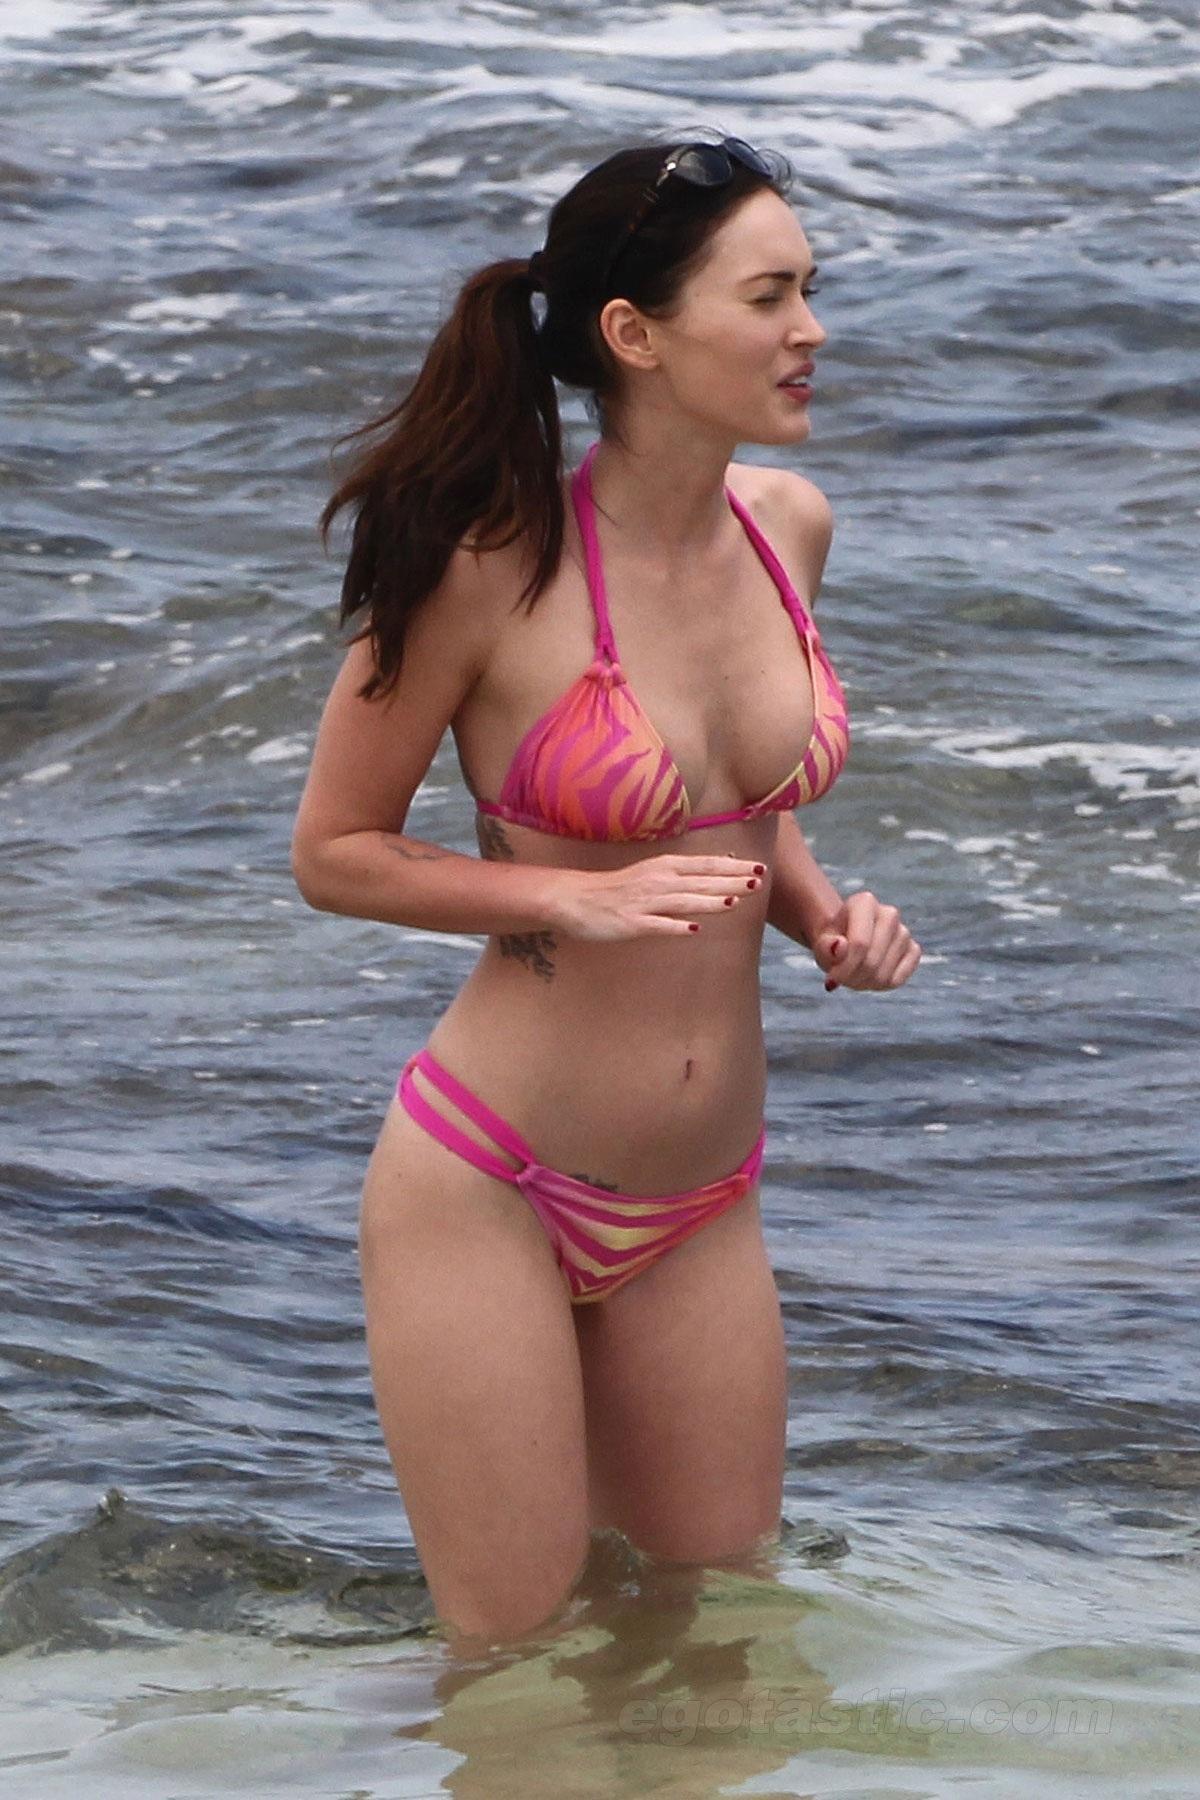 Bikini Megan Strand nudes (29 photo), Tits, Is a cute, Instagram, see through 2020